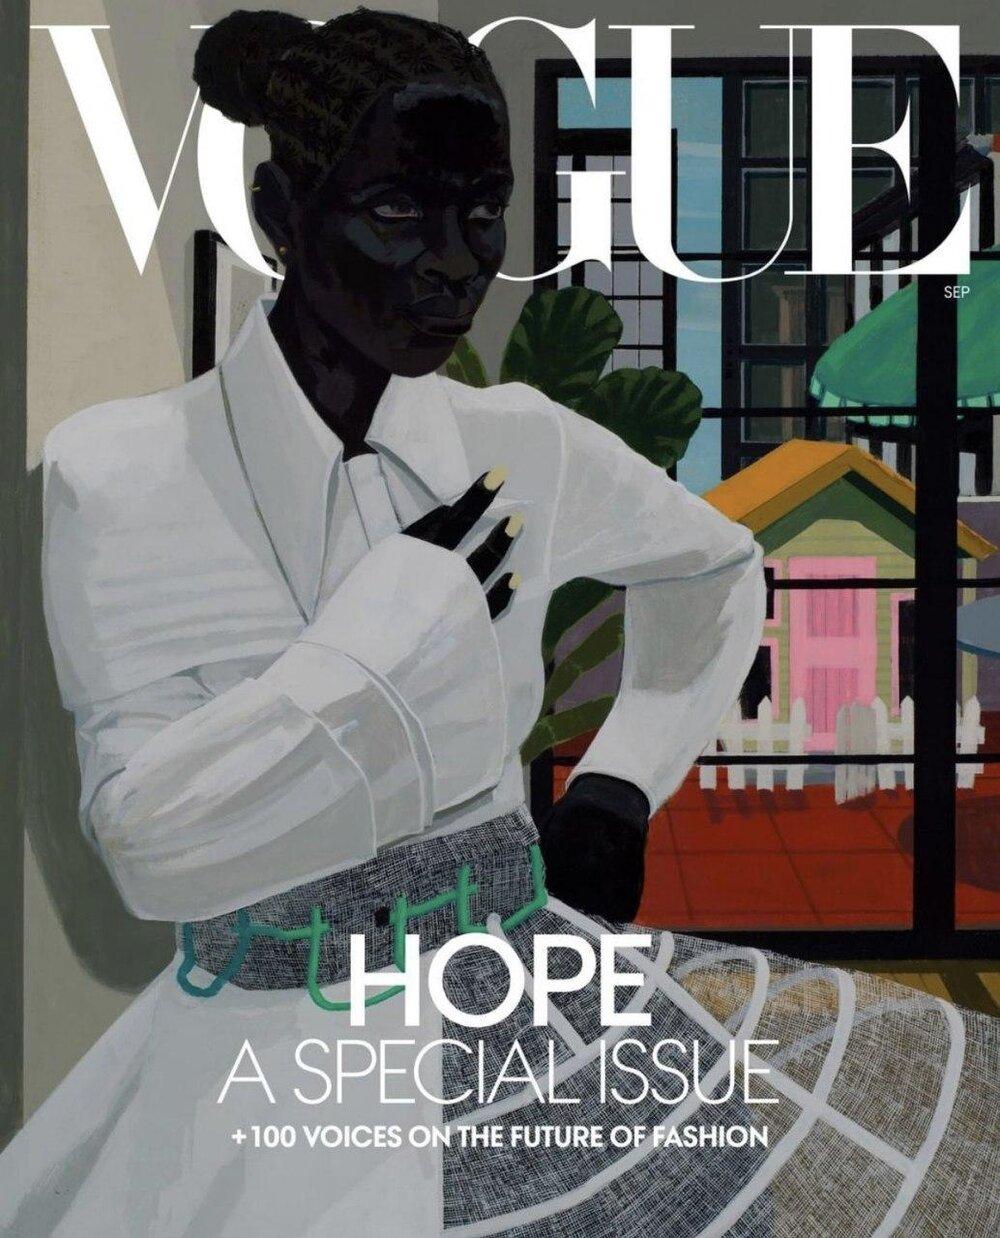 Kerry James Marshall/Vogue